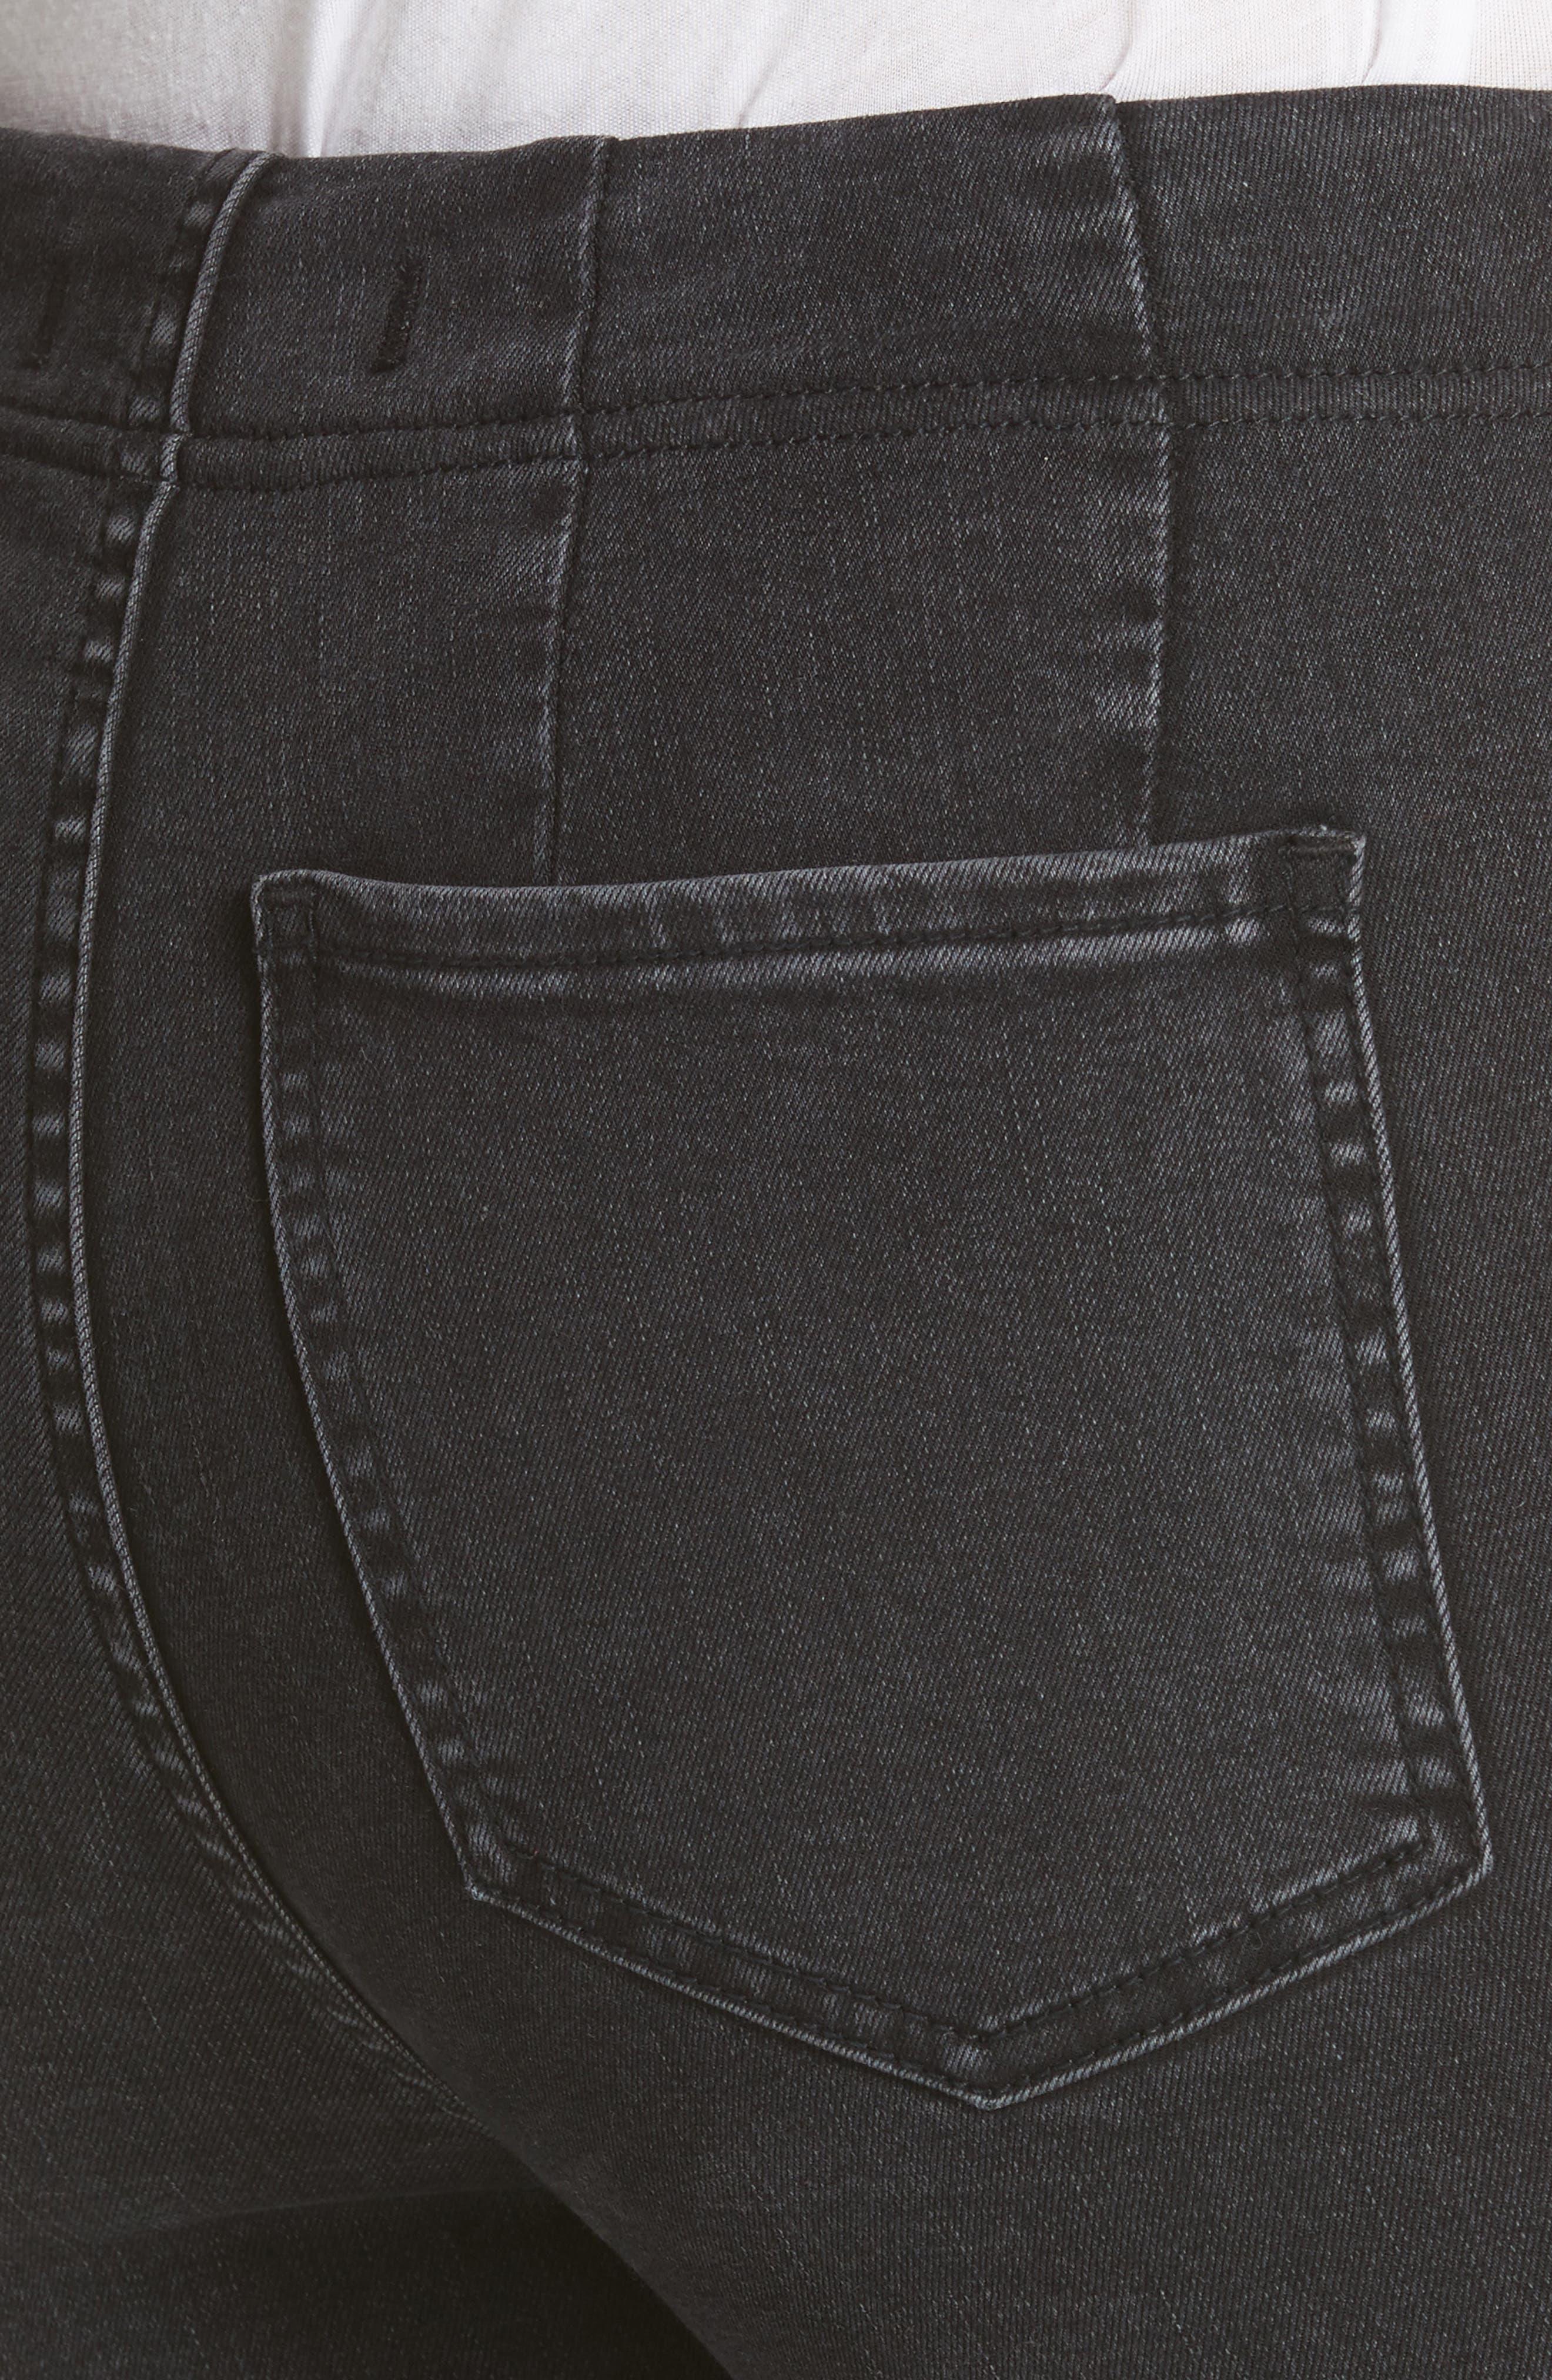 Ultra High Waist Crop Bootcut Jeans,                             Alternate thumbnail 4, color,                             001